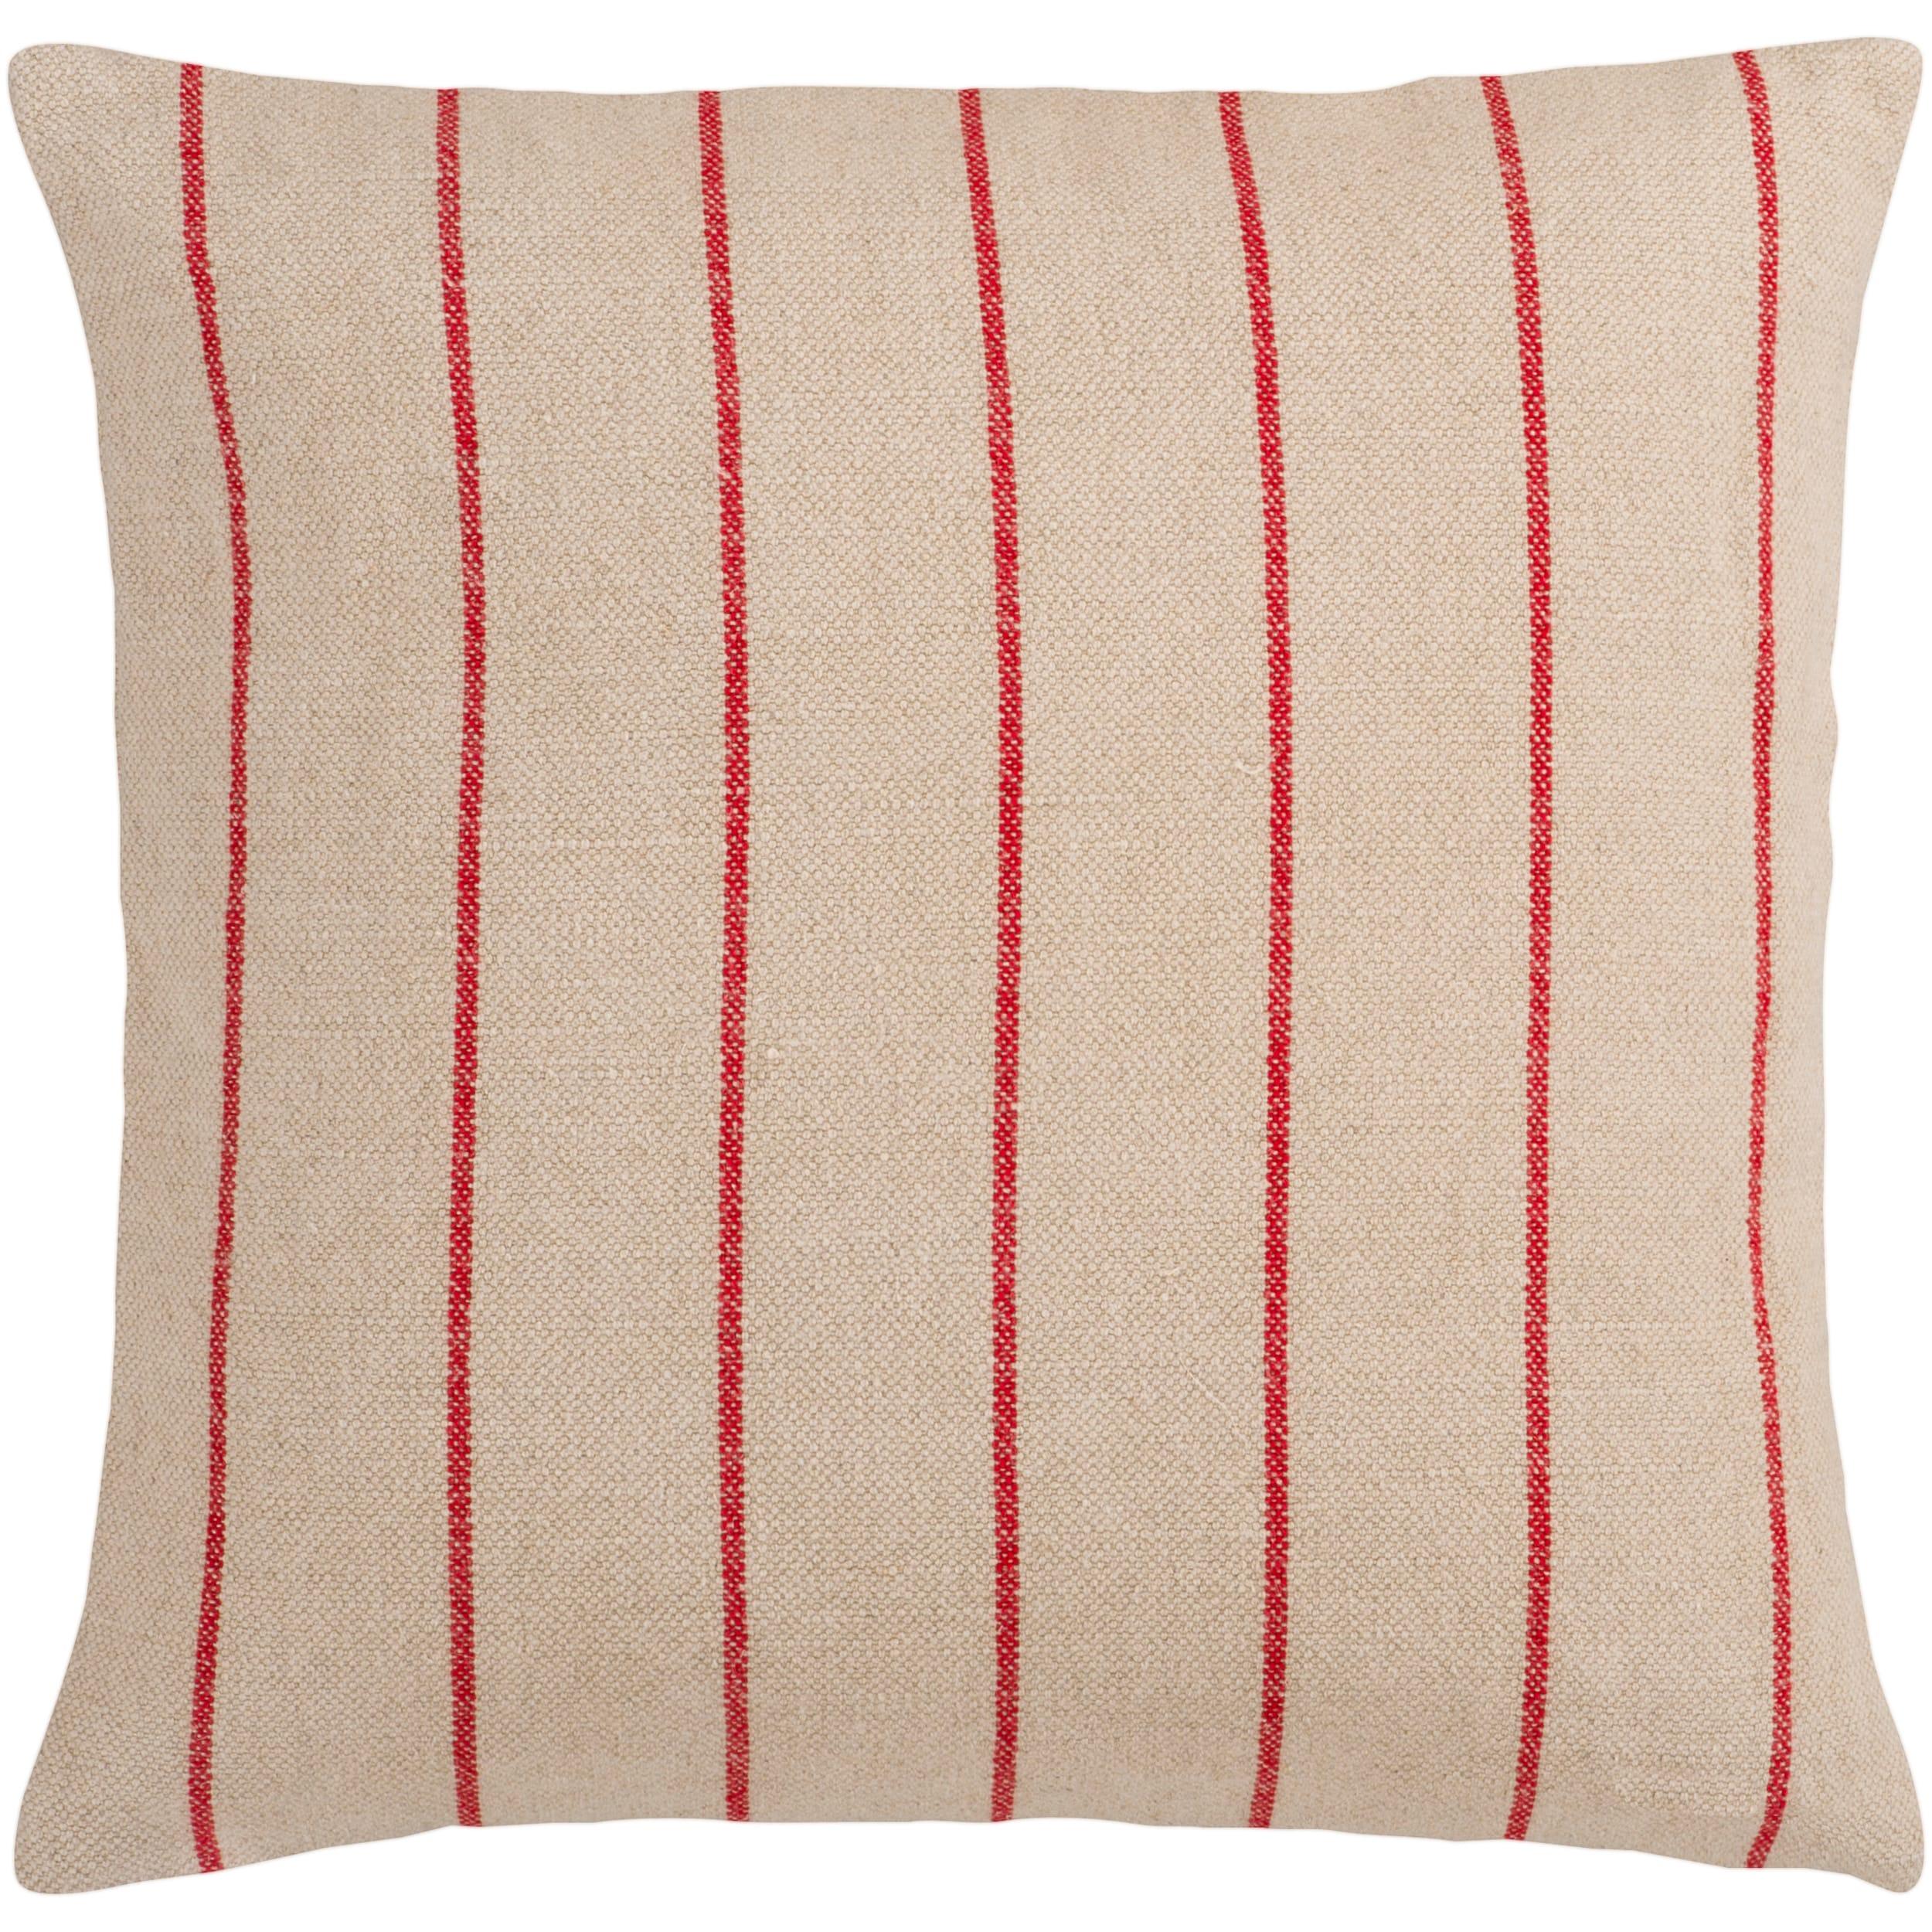 Decorative Liber 18-inch Pillow